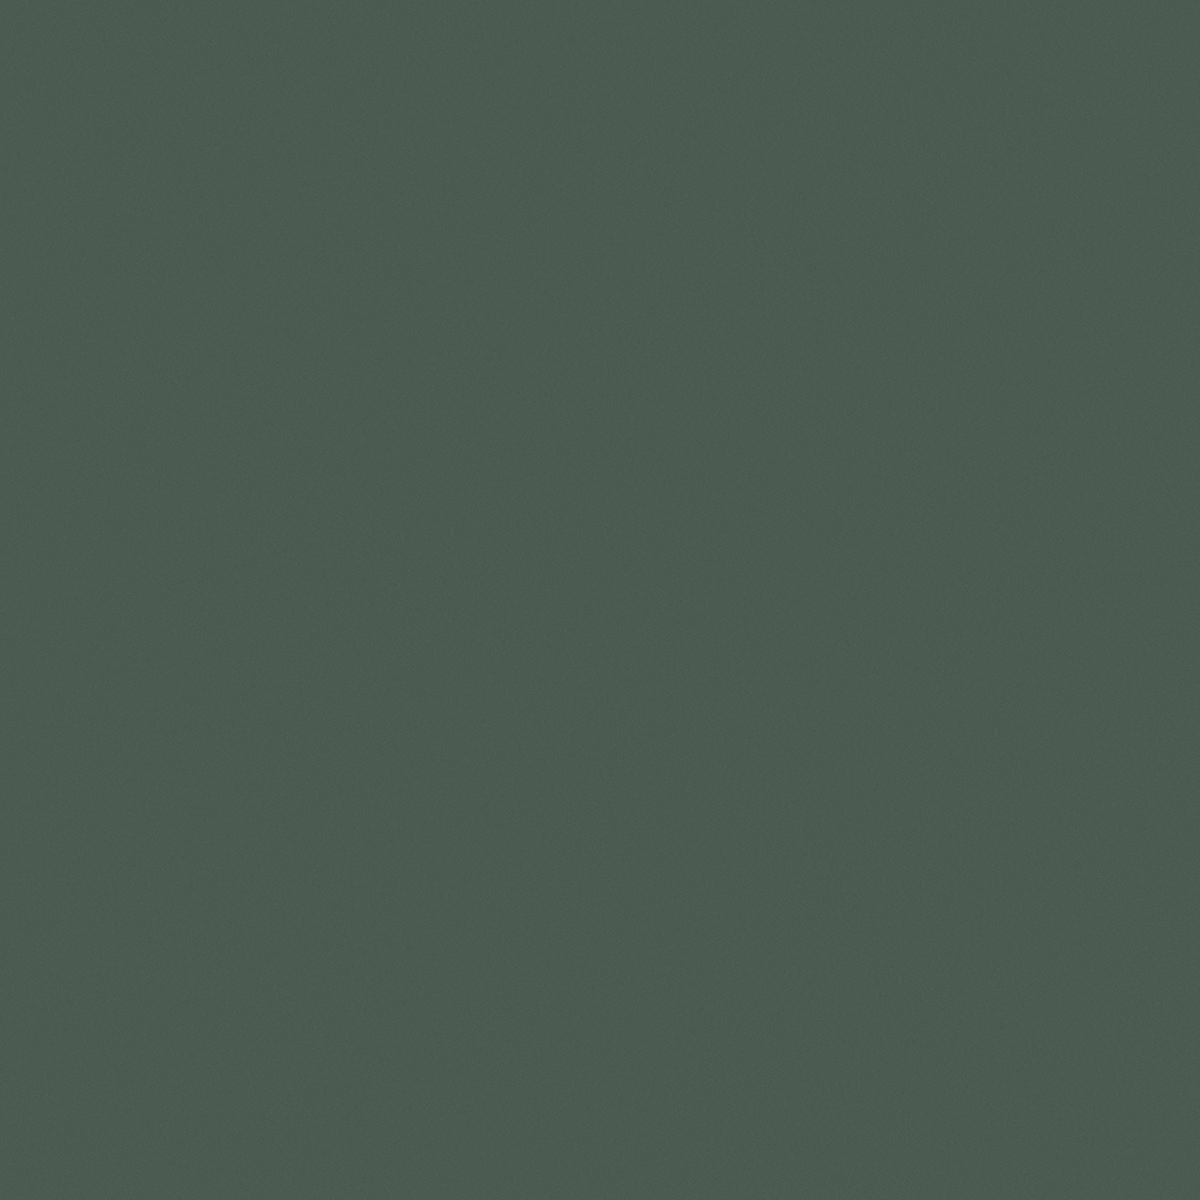 Tapet lavabil Sten 583-88, Sandberg, 5.3mp / rola